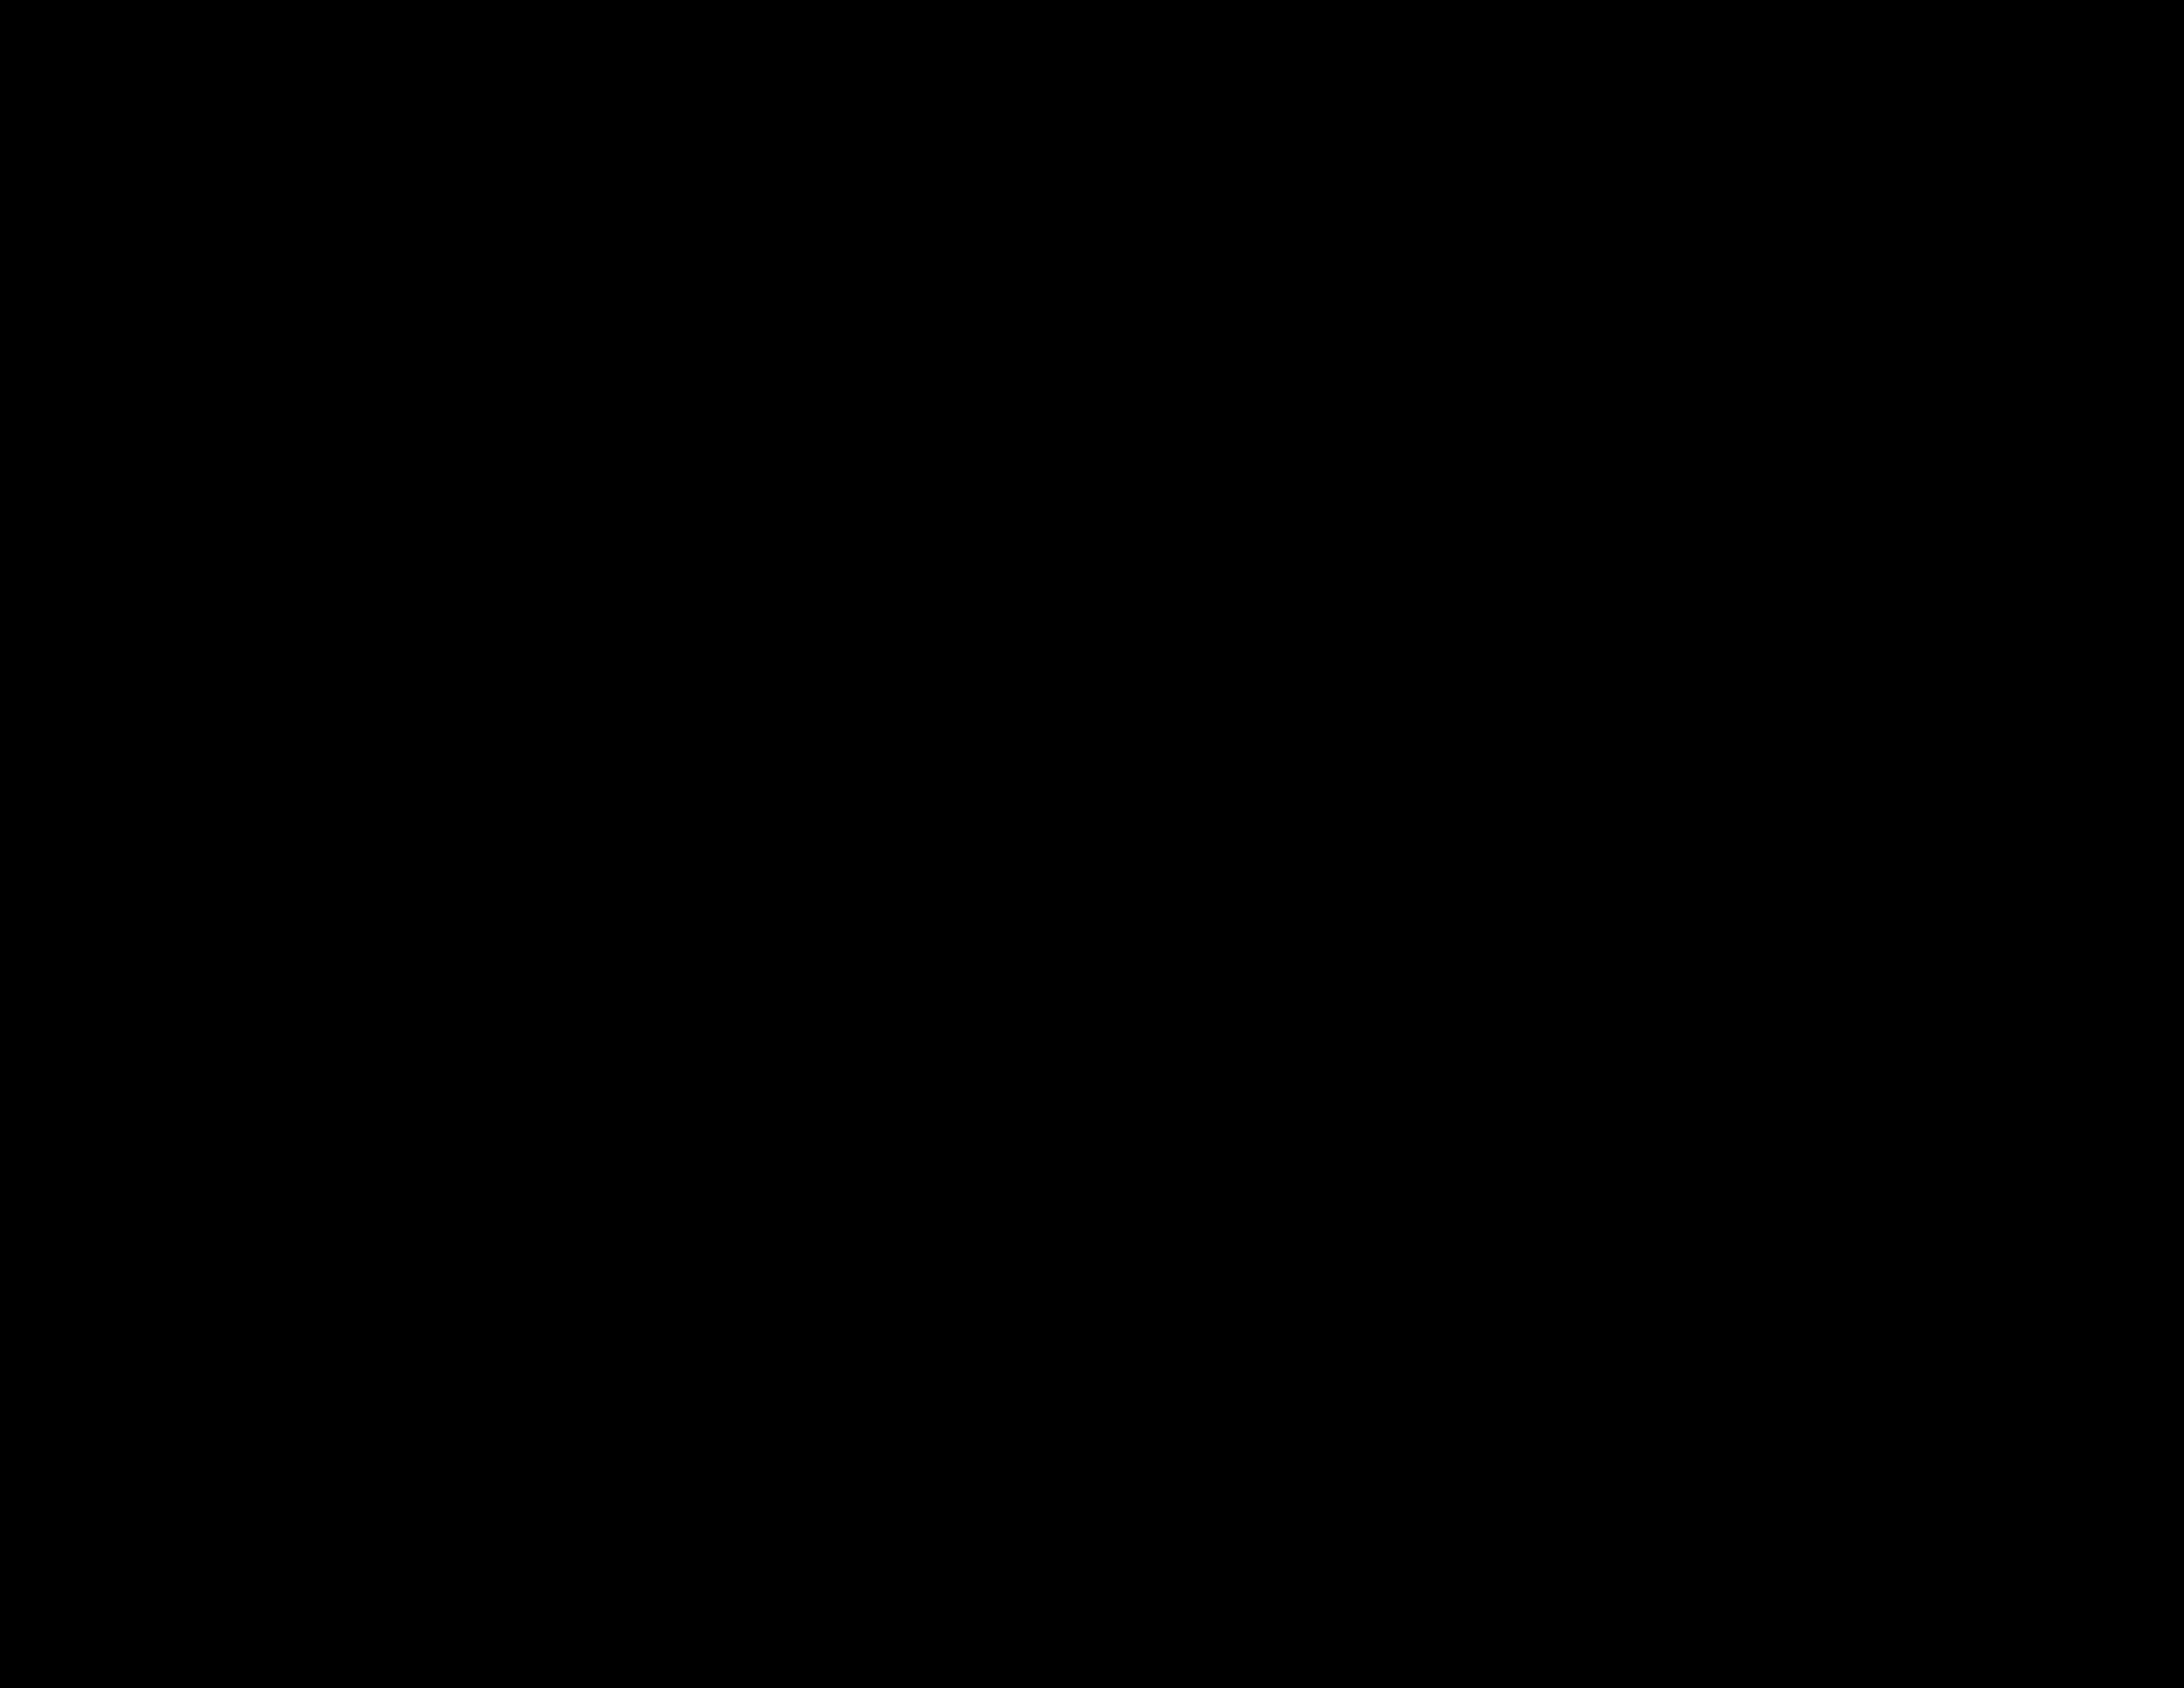 logo_vector_dark.png